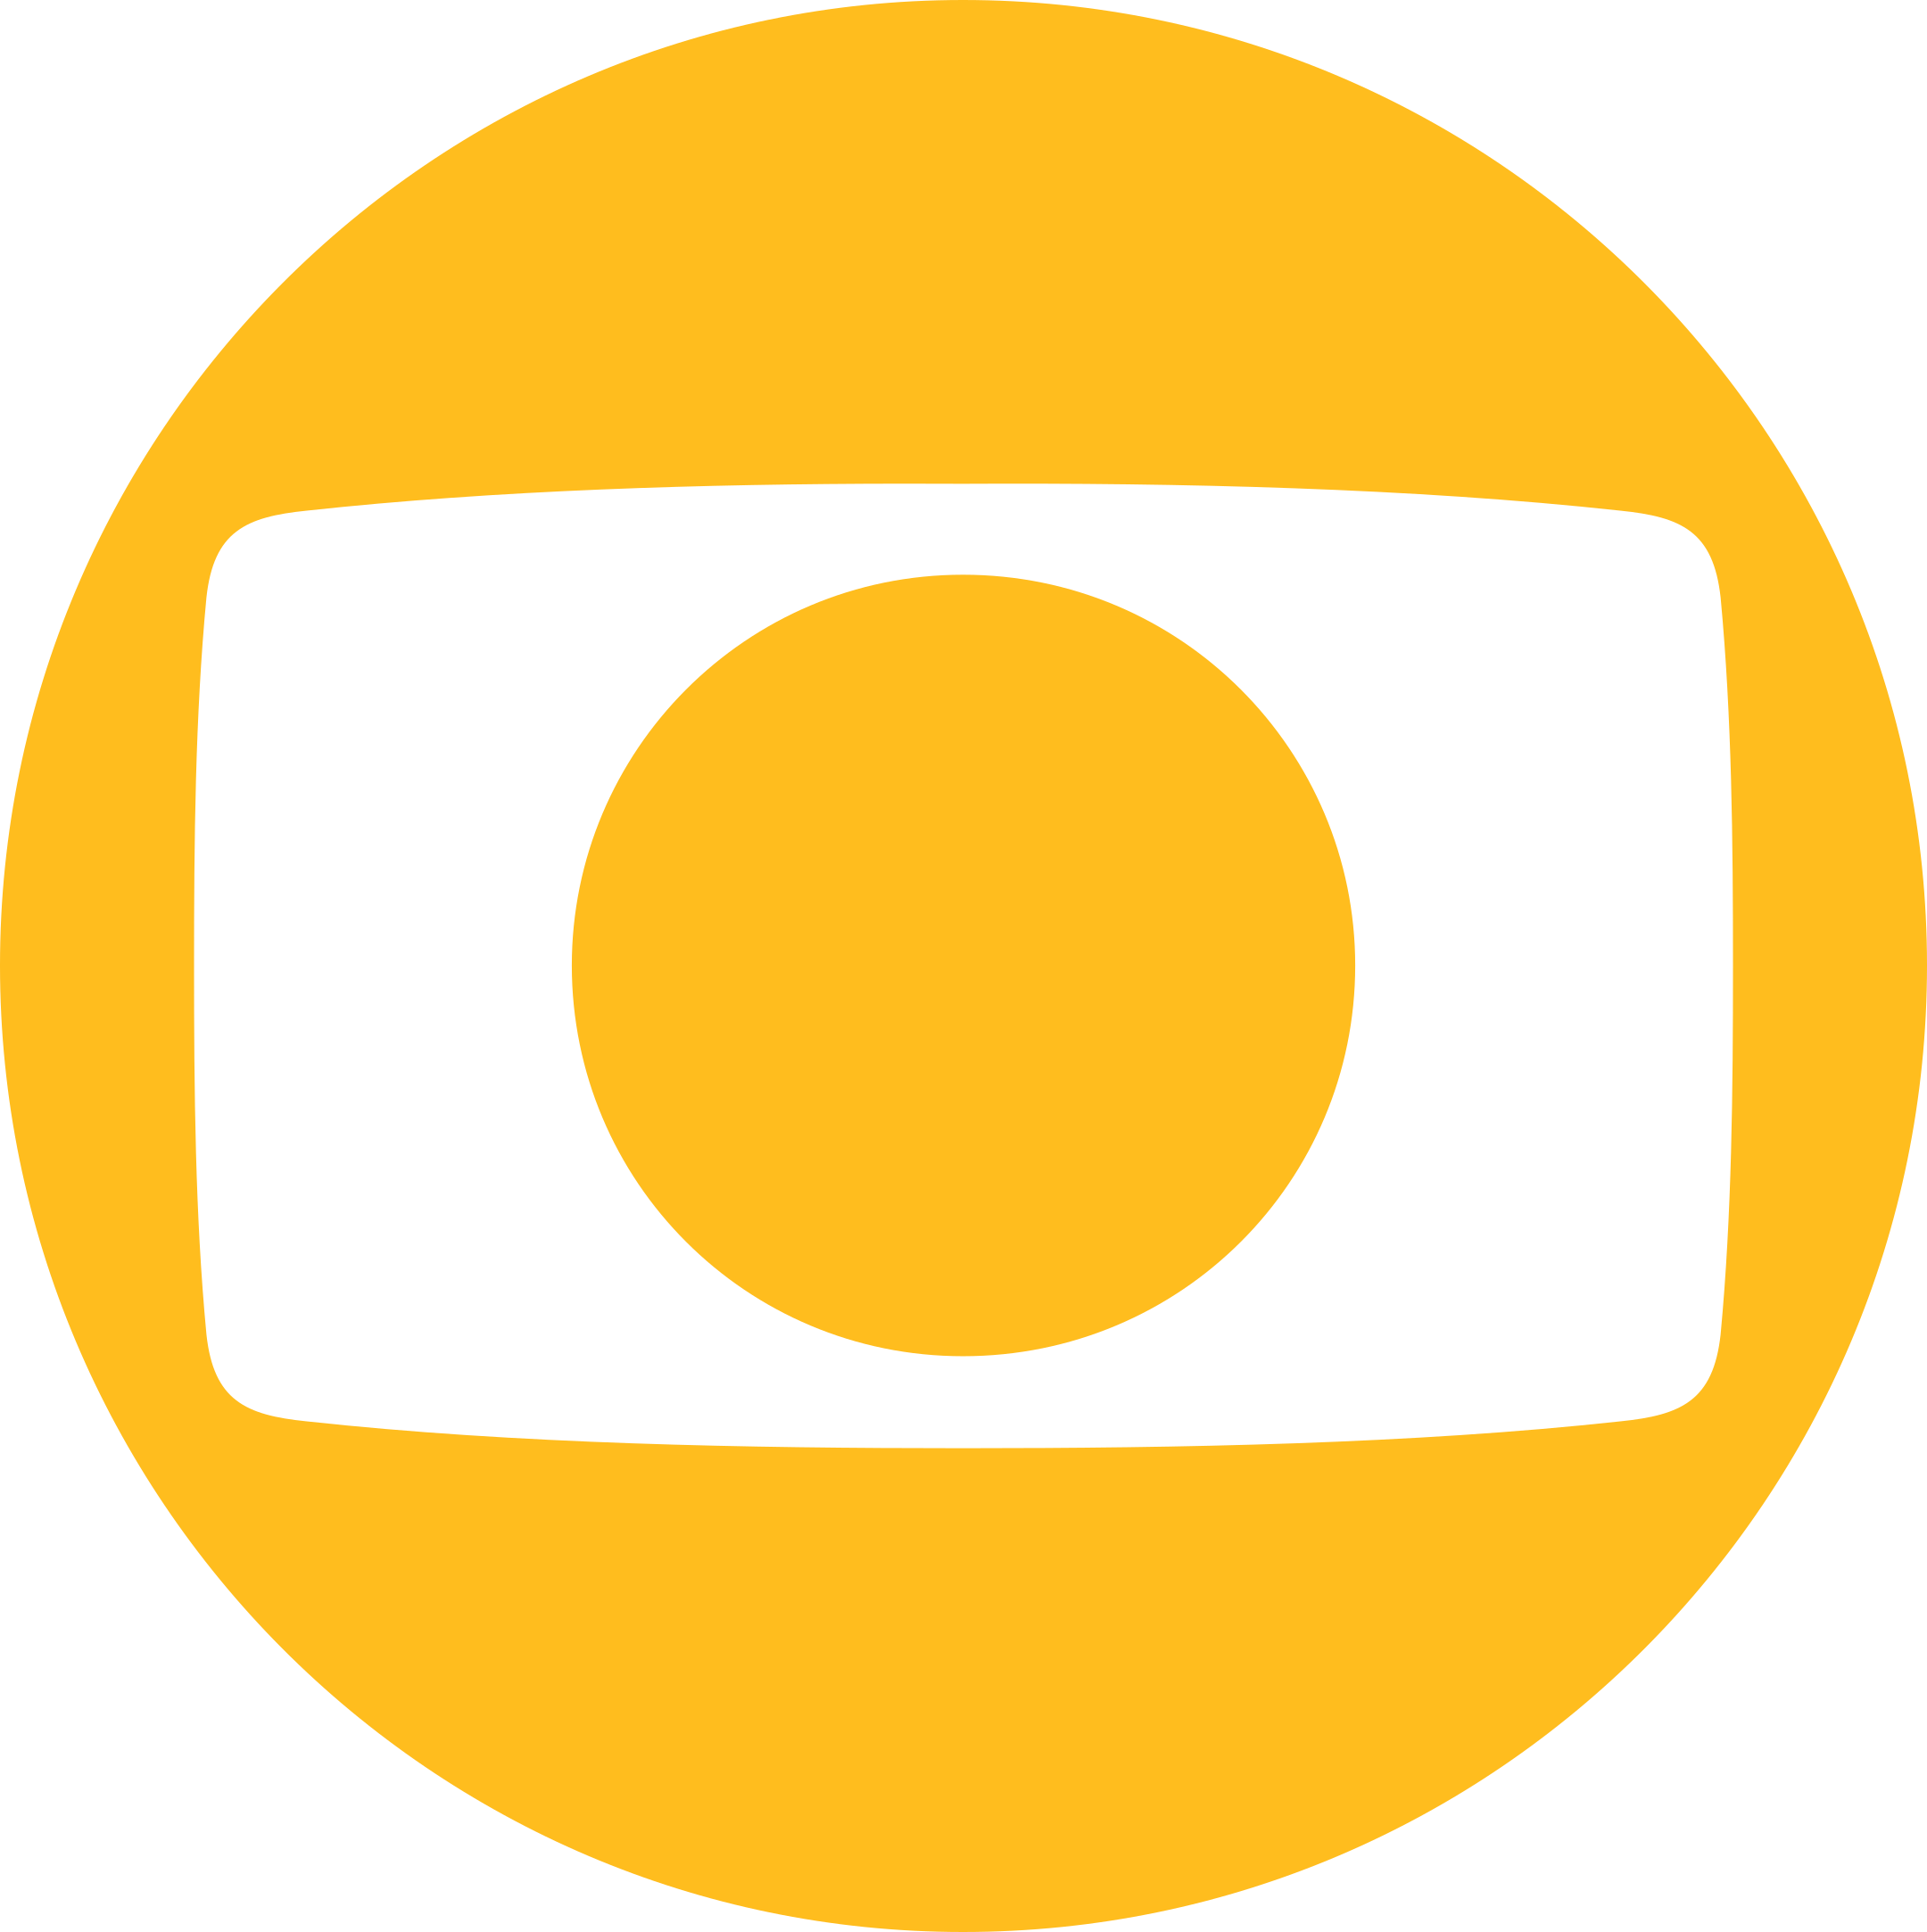 Rede Globo Logo amarelo.